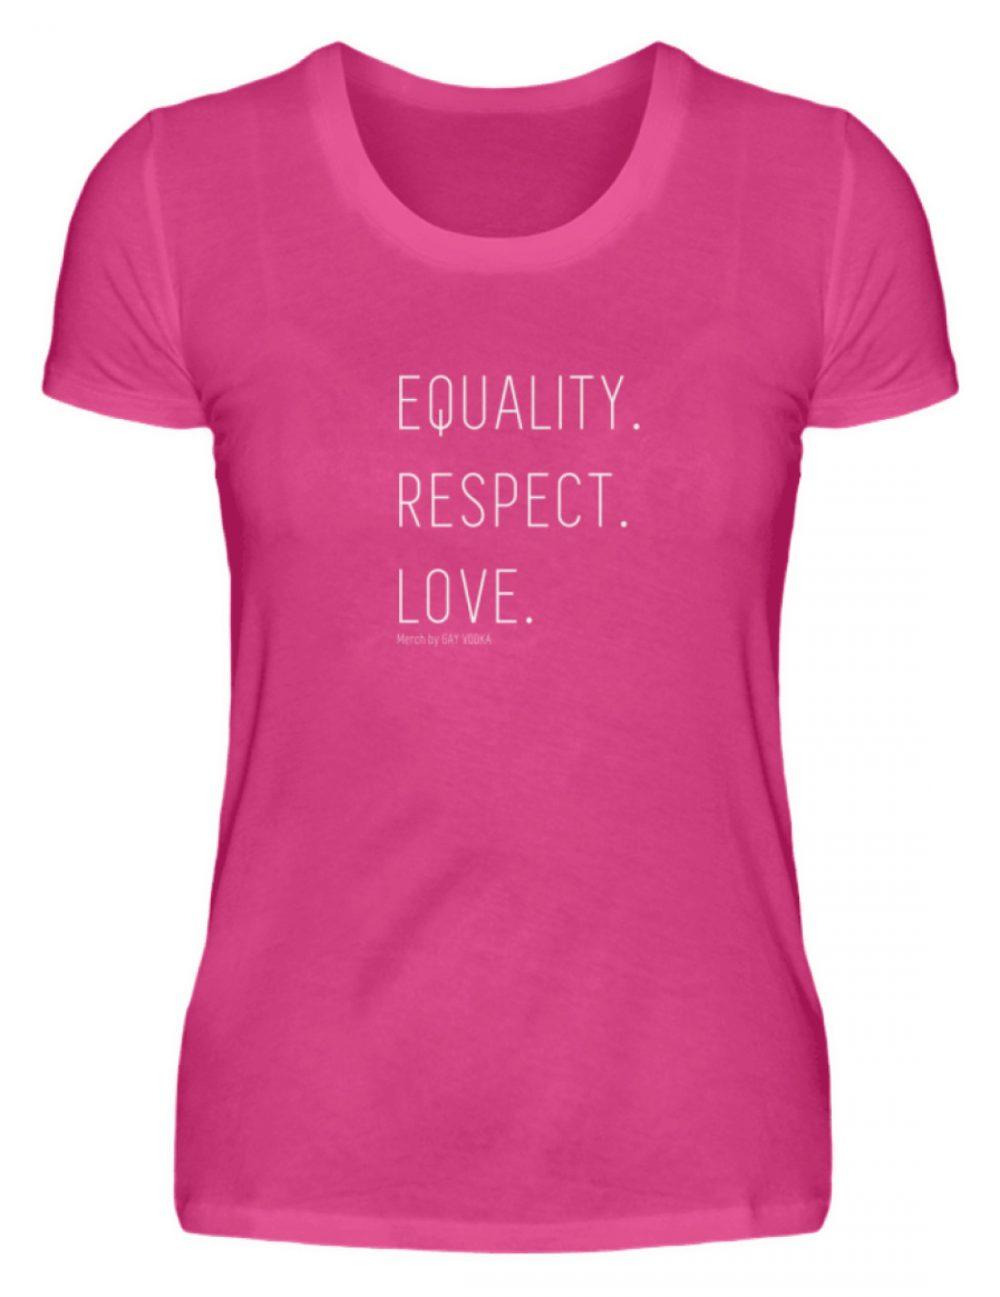 EQUALITY. RESPECT. LOVE. - Damen Premiumshirt-28